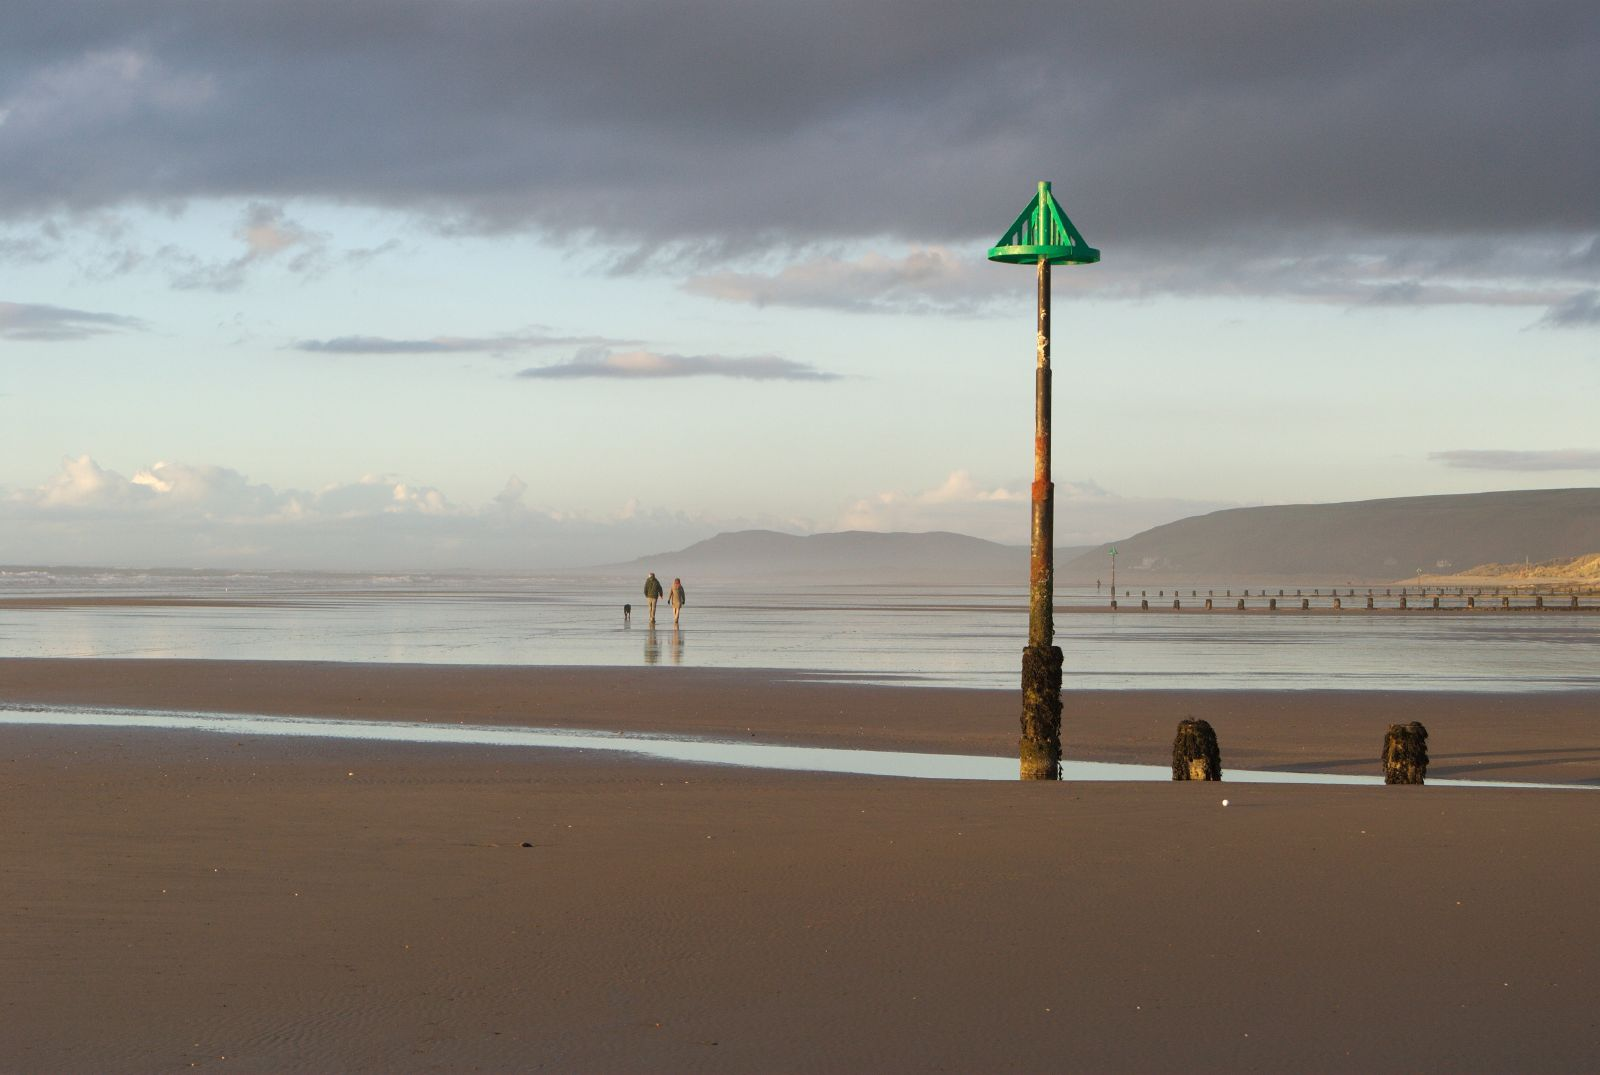 of Borth Beach to usher in